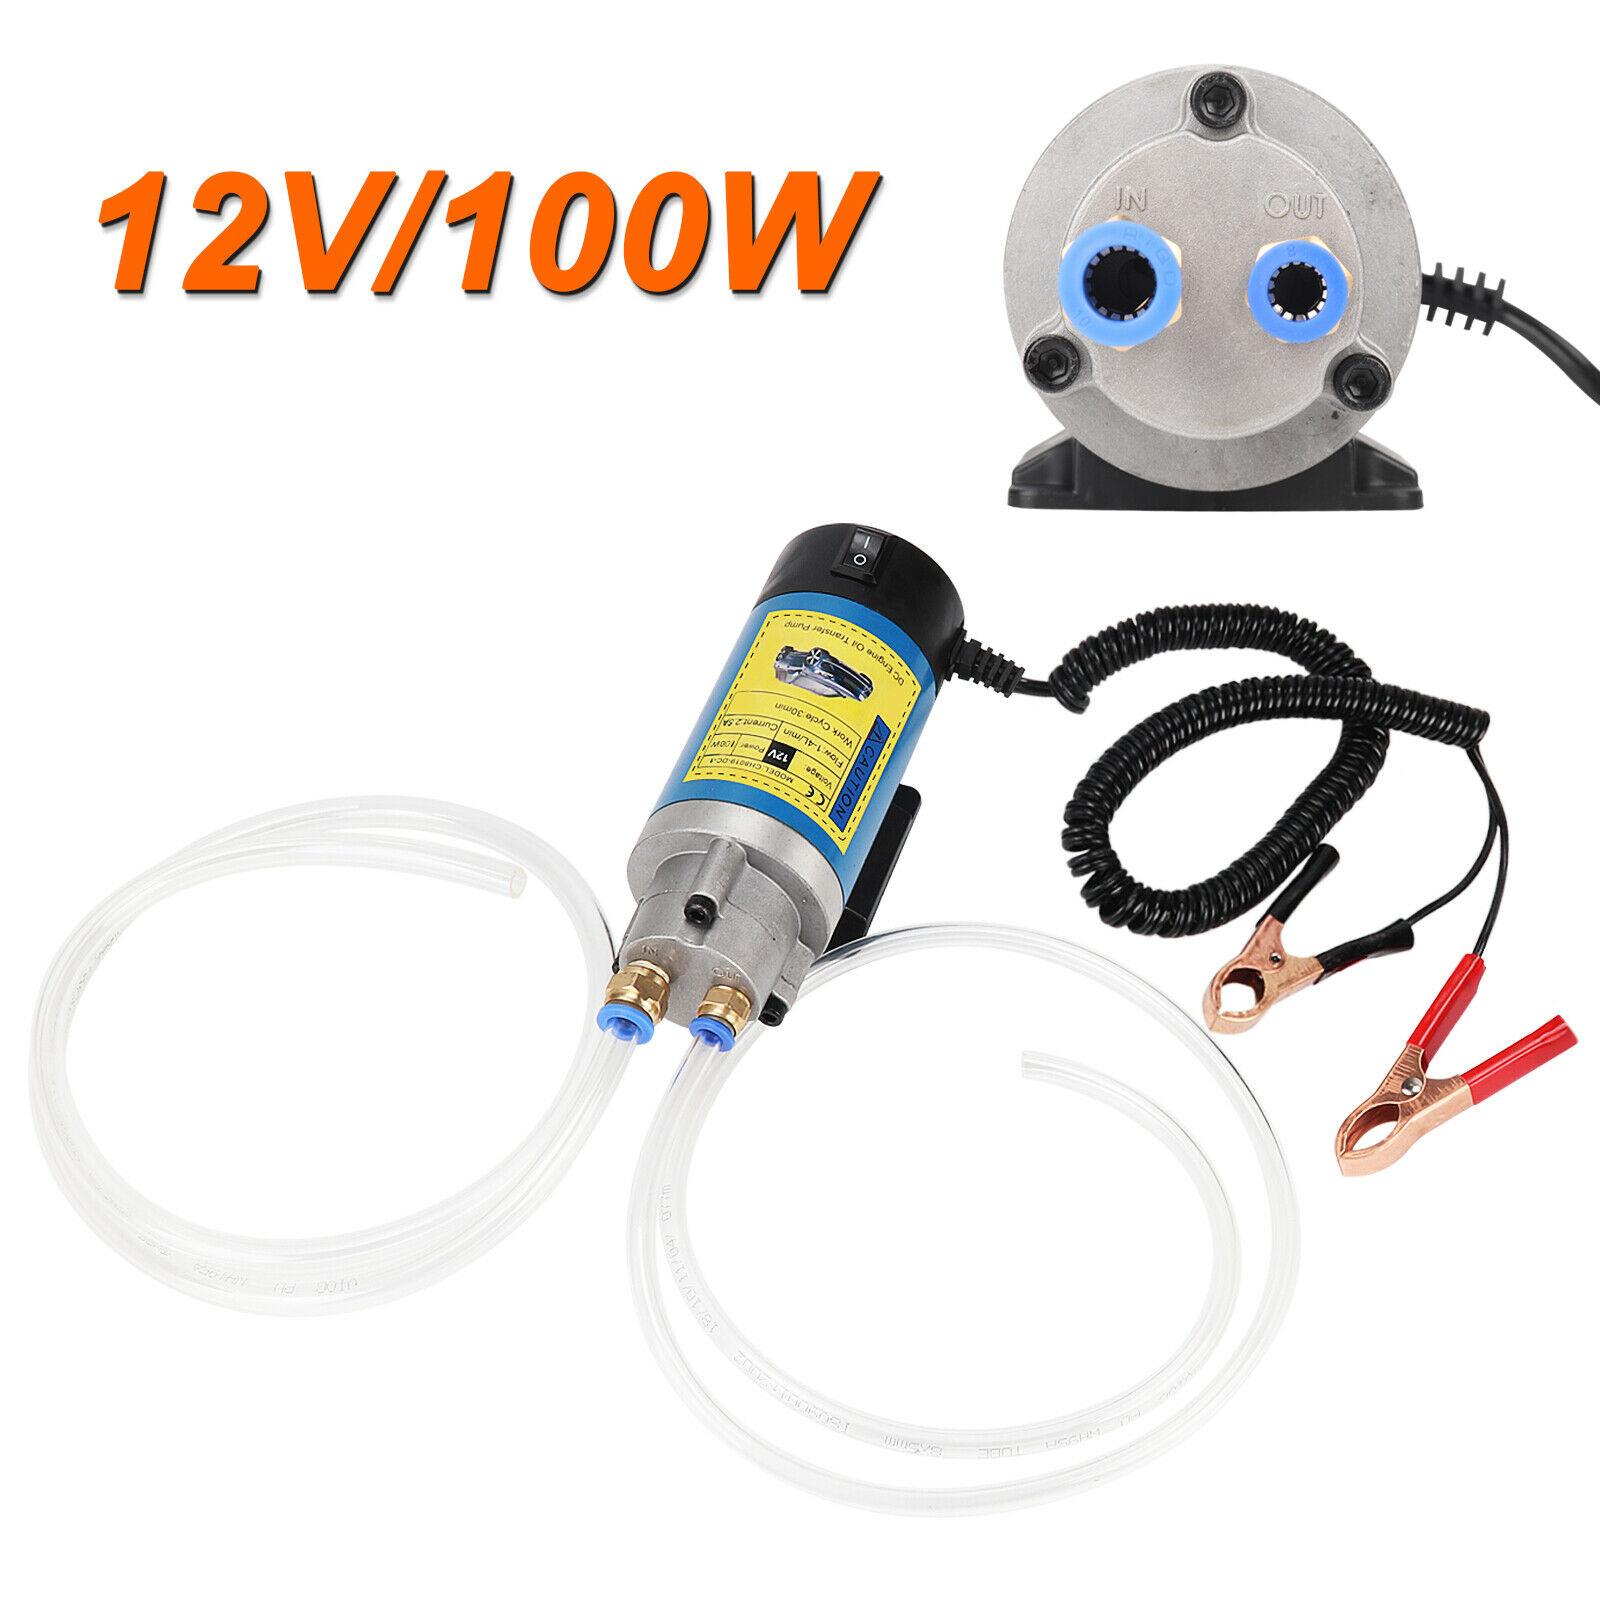 100 W 12 V Elektrische Olie Overdracht Extractor Vloeistof Diesel Pomp Sifon Auto Motor